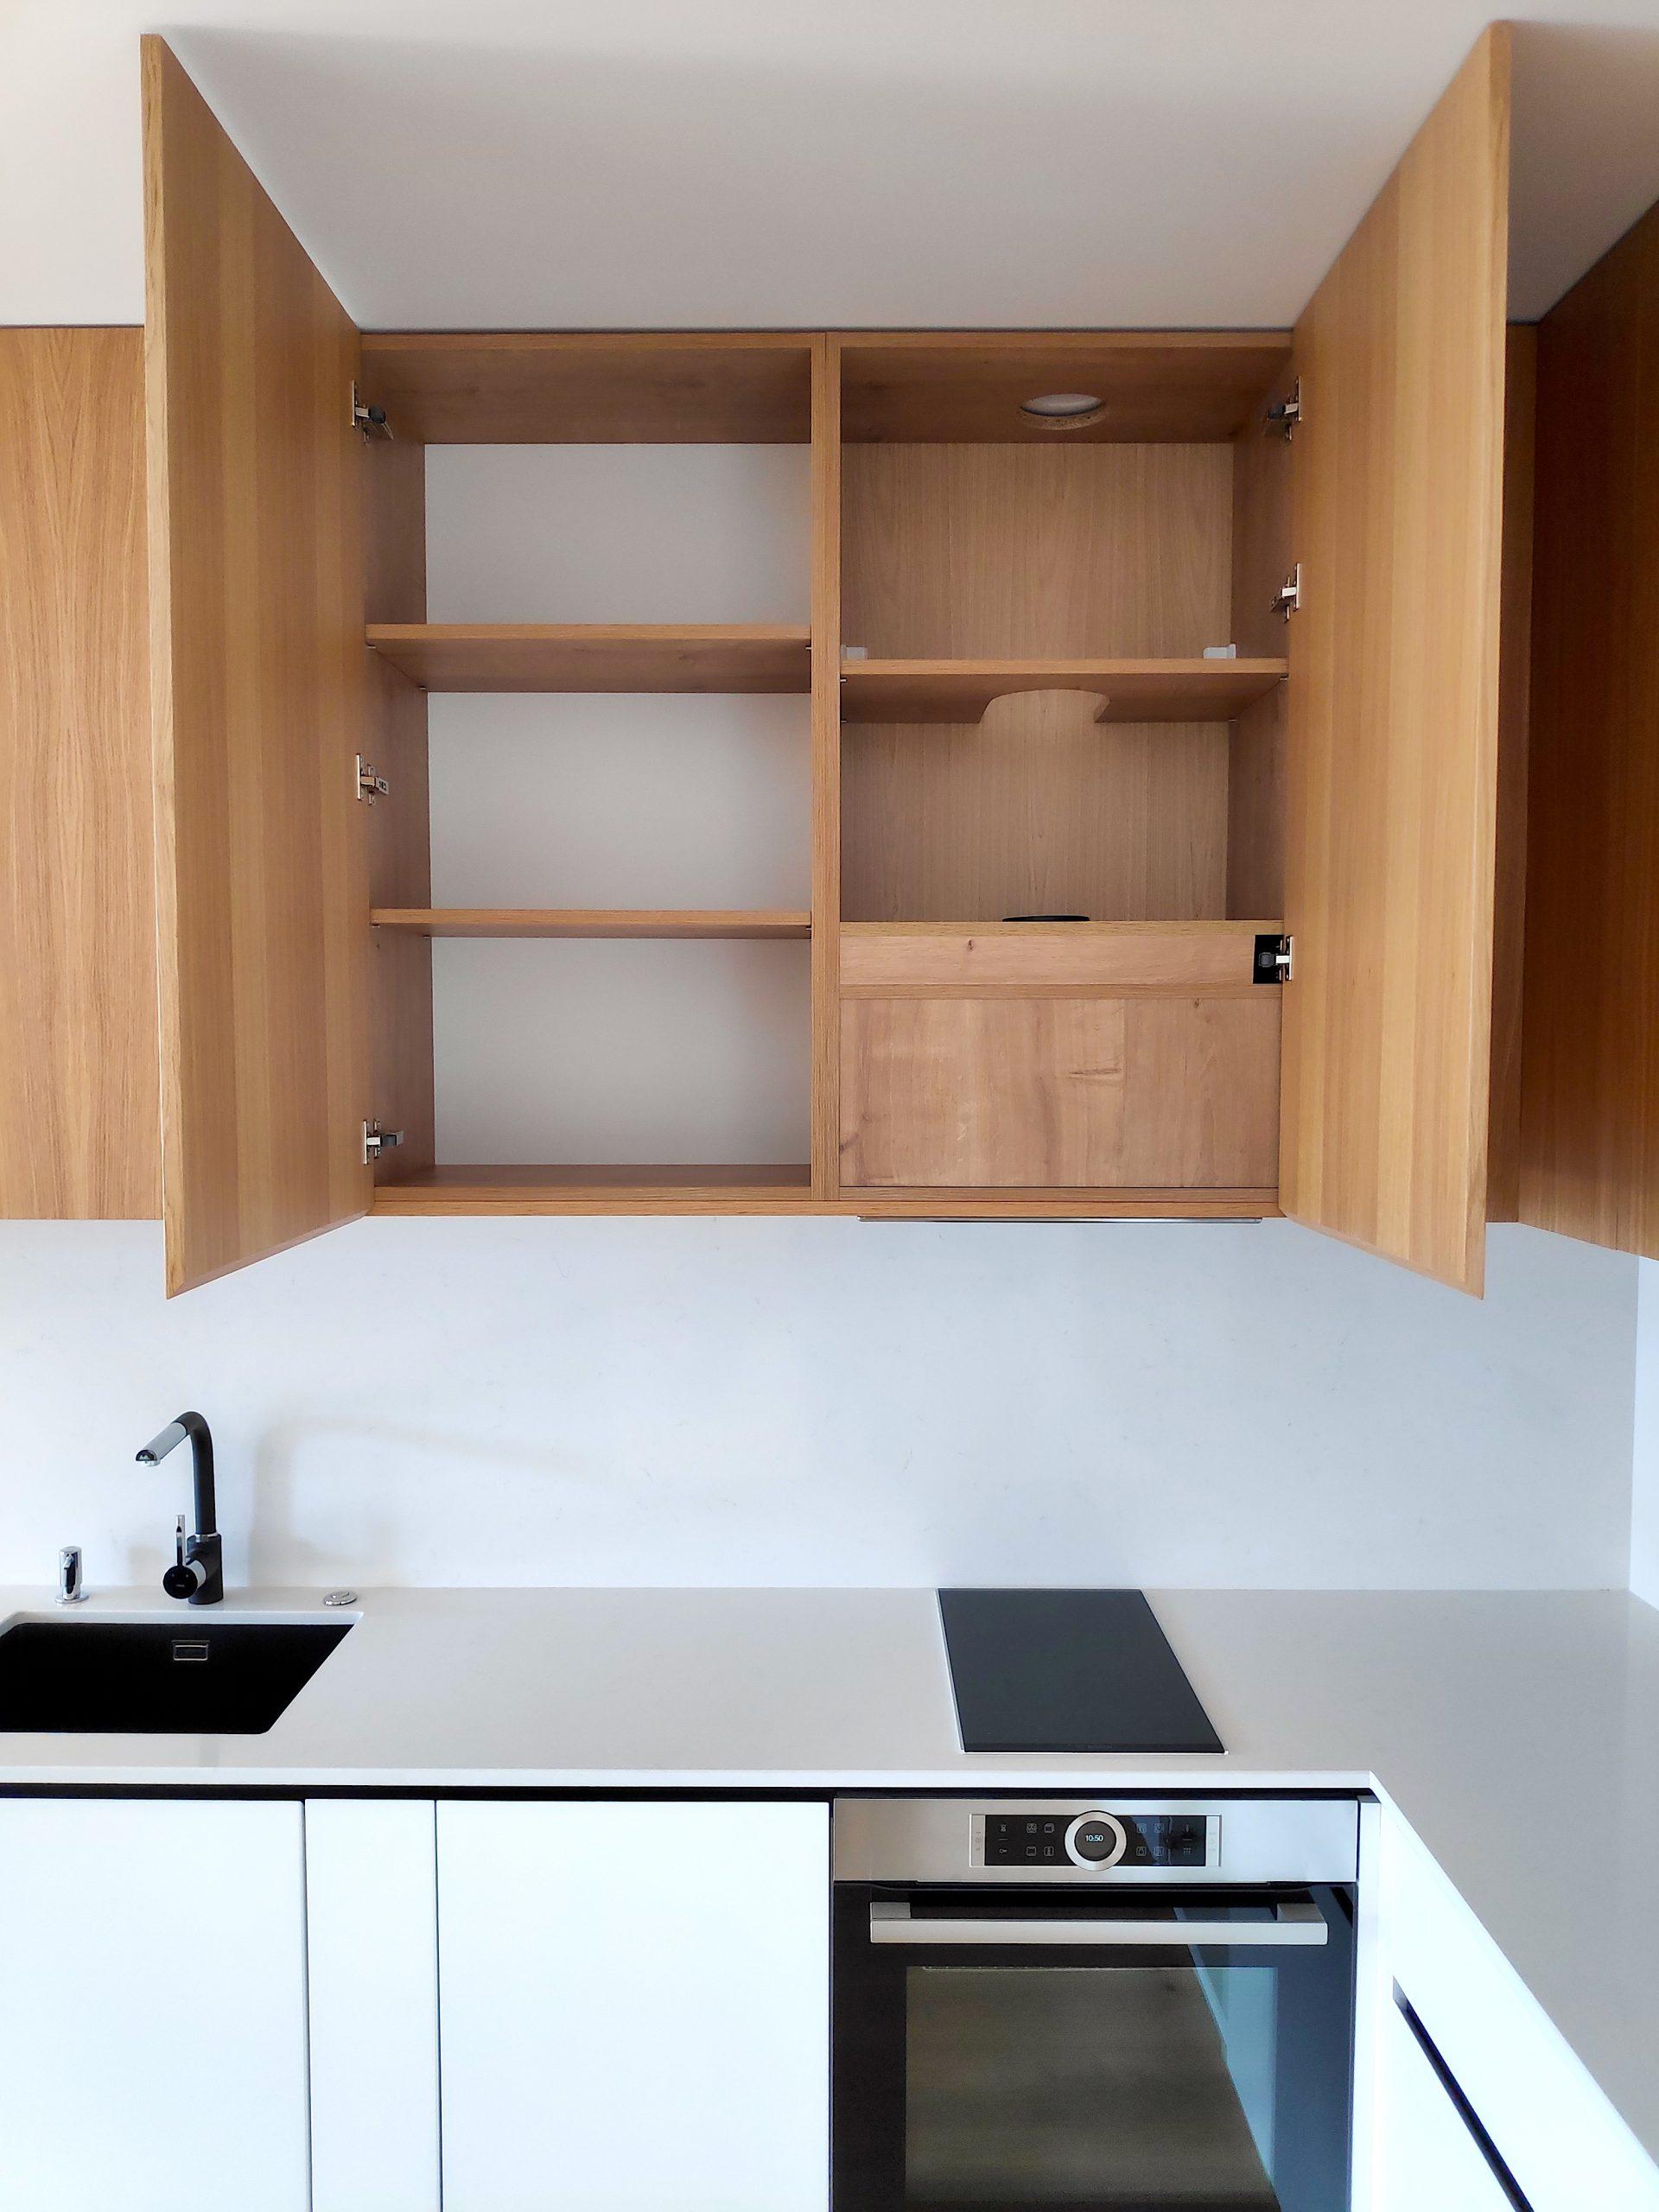 Кухня шкаф отворен